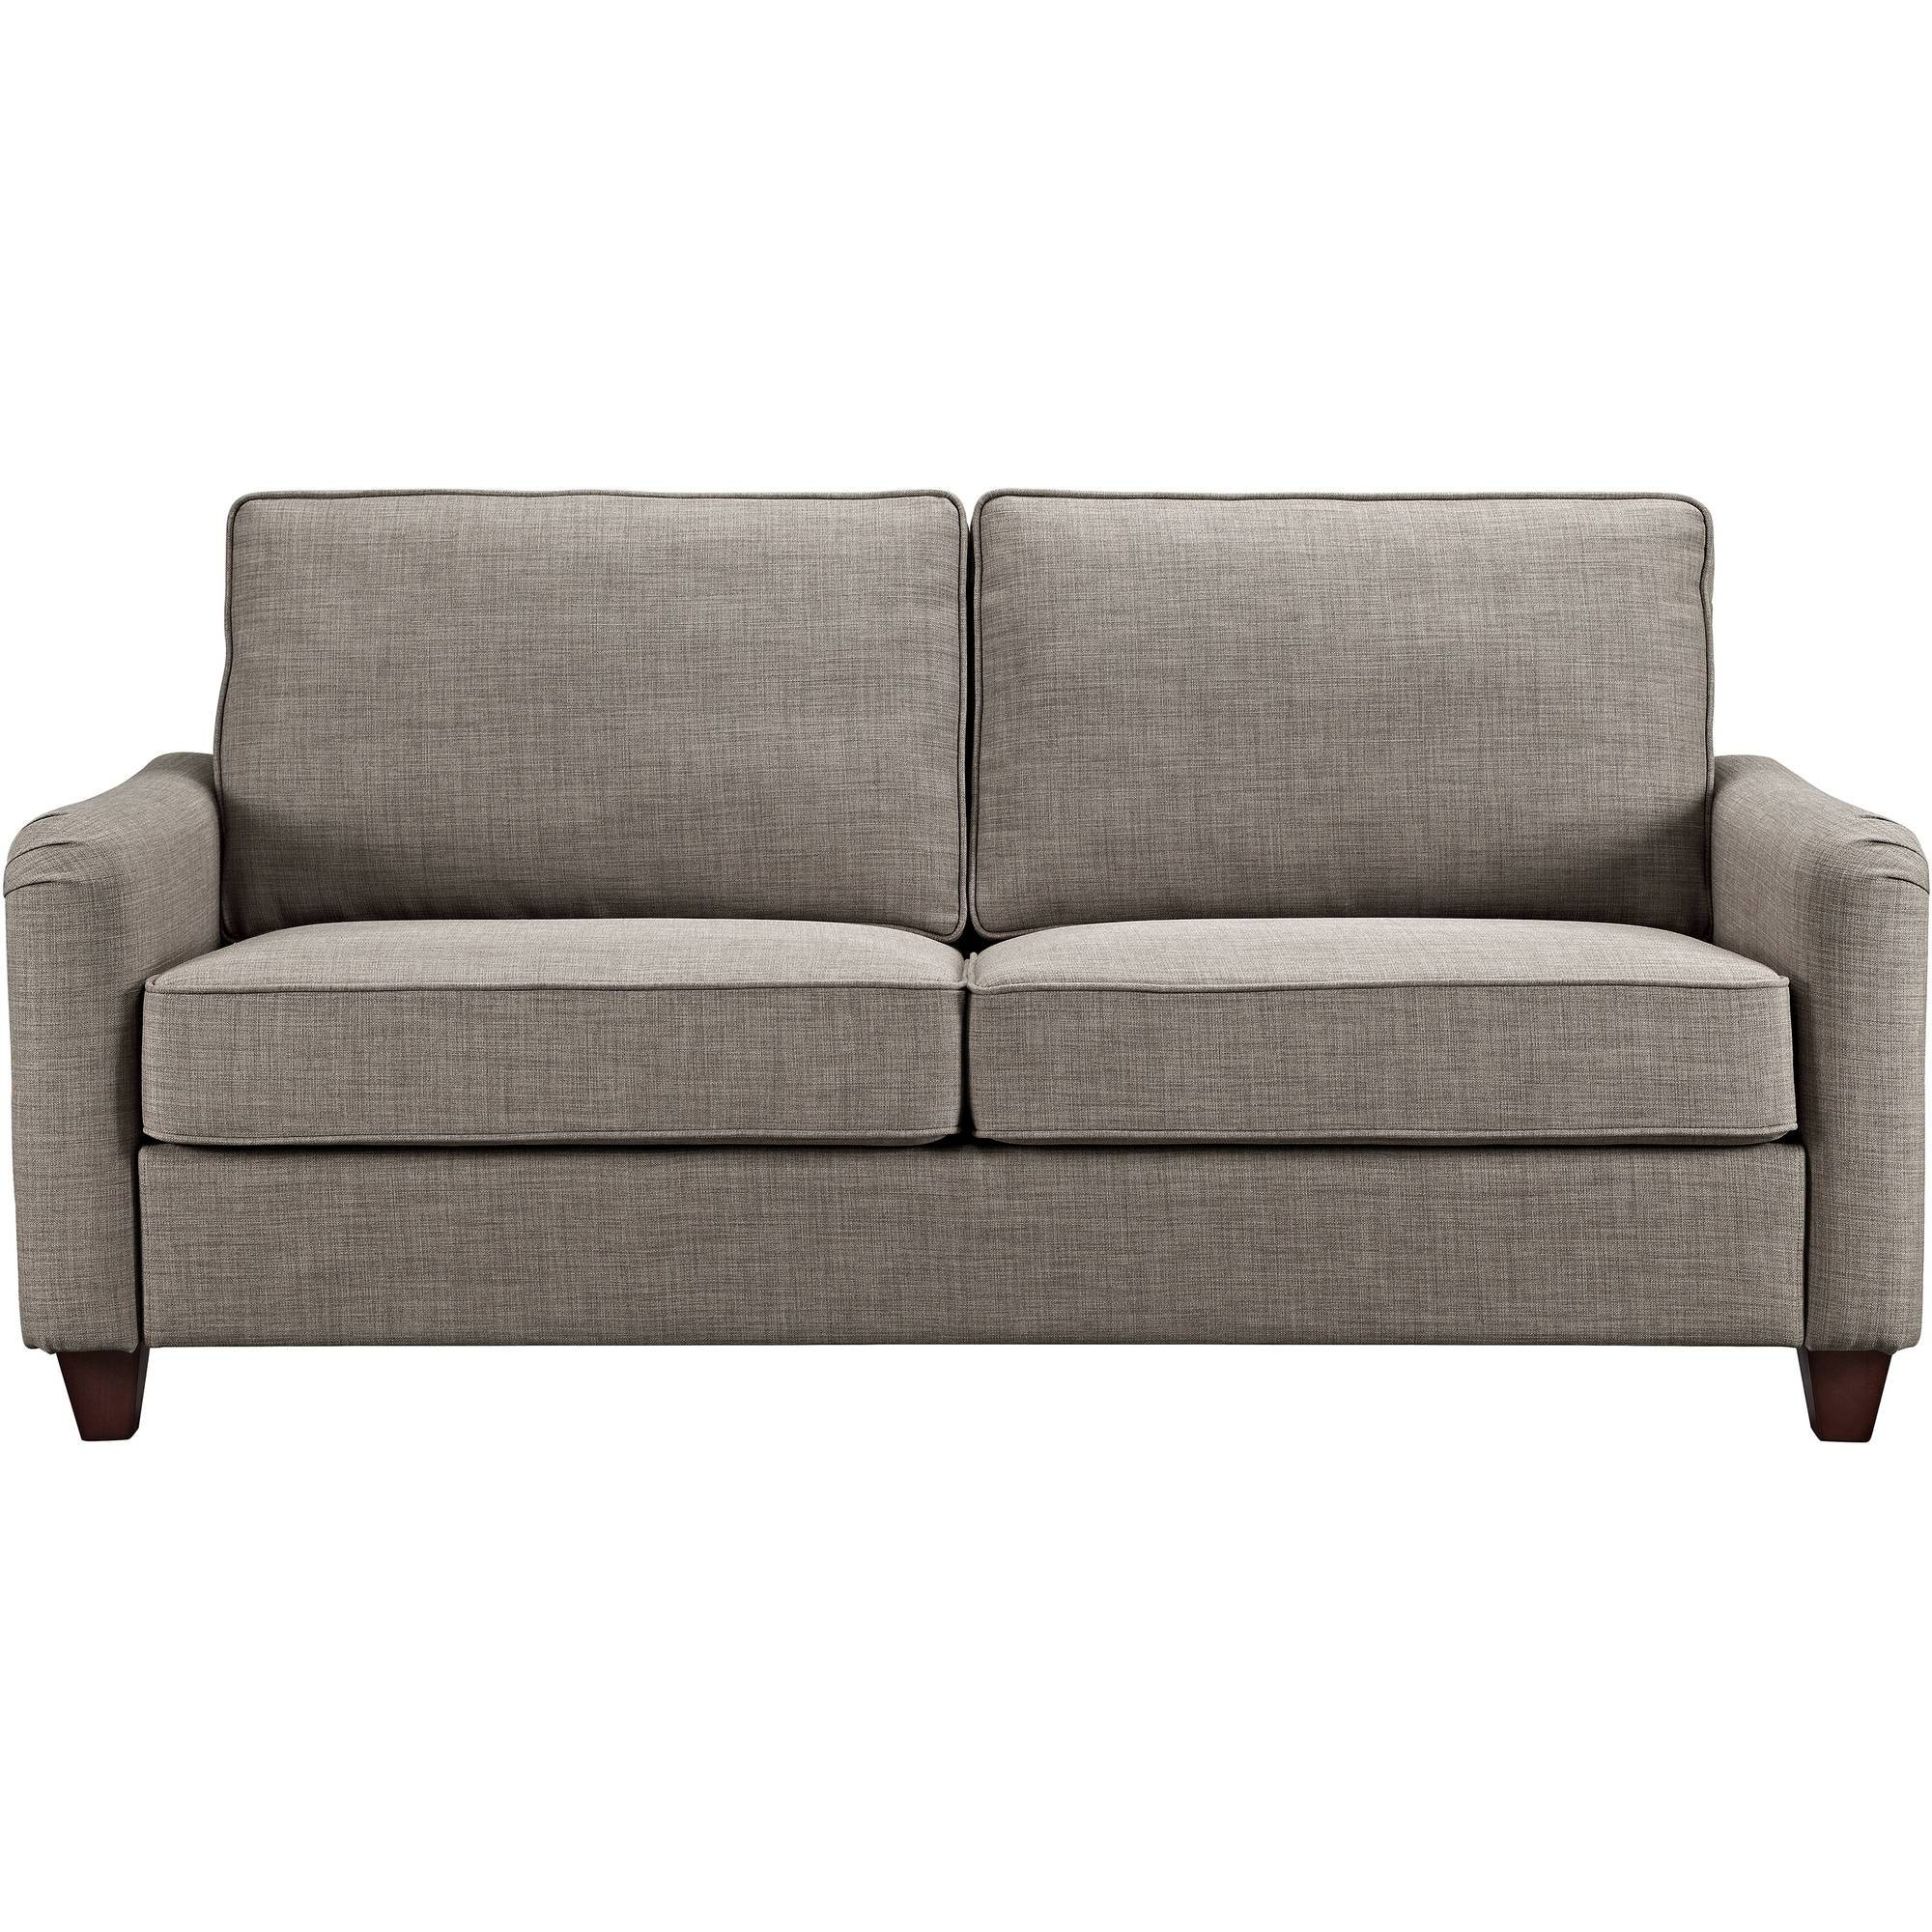 Living Room Furniture regarding Living Room Sofas (Image 15 of 30)